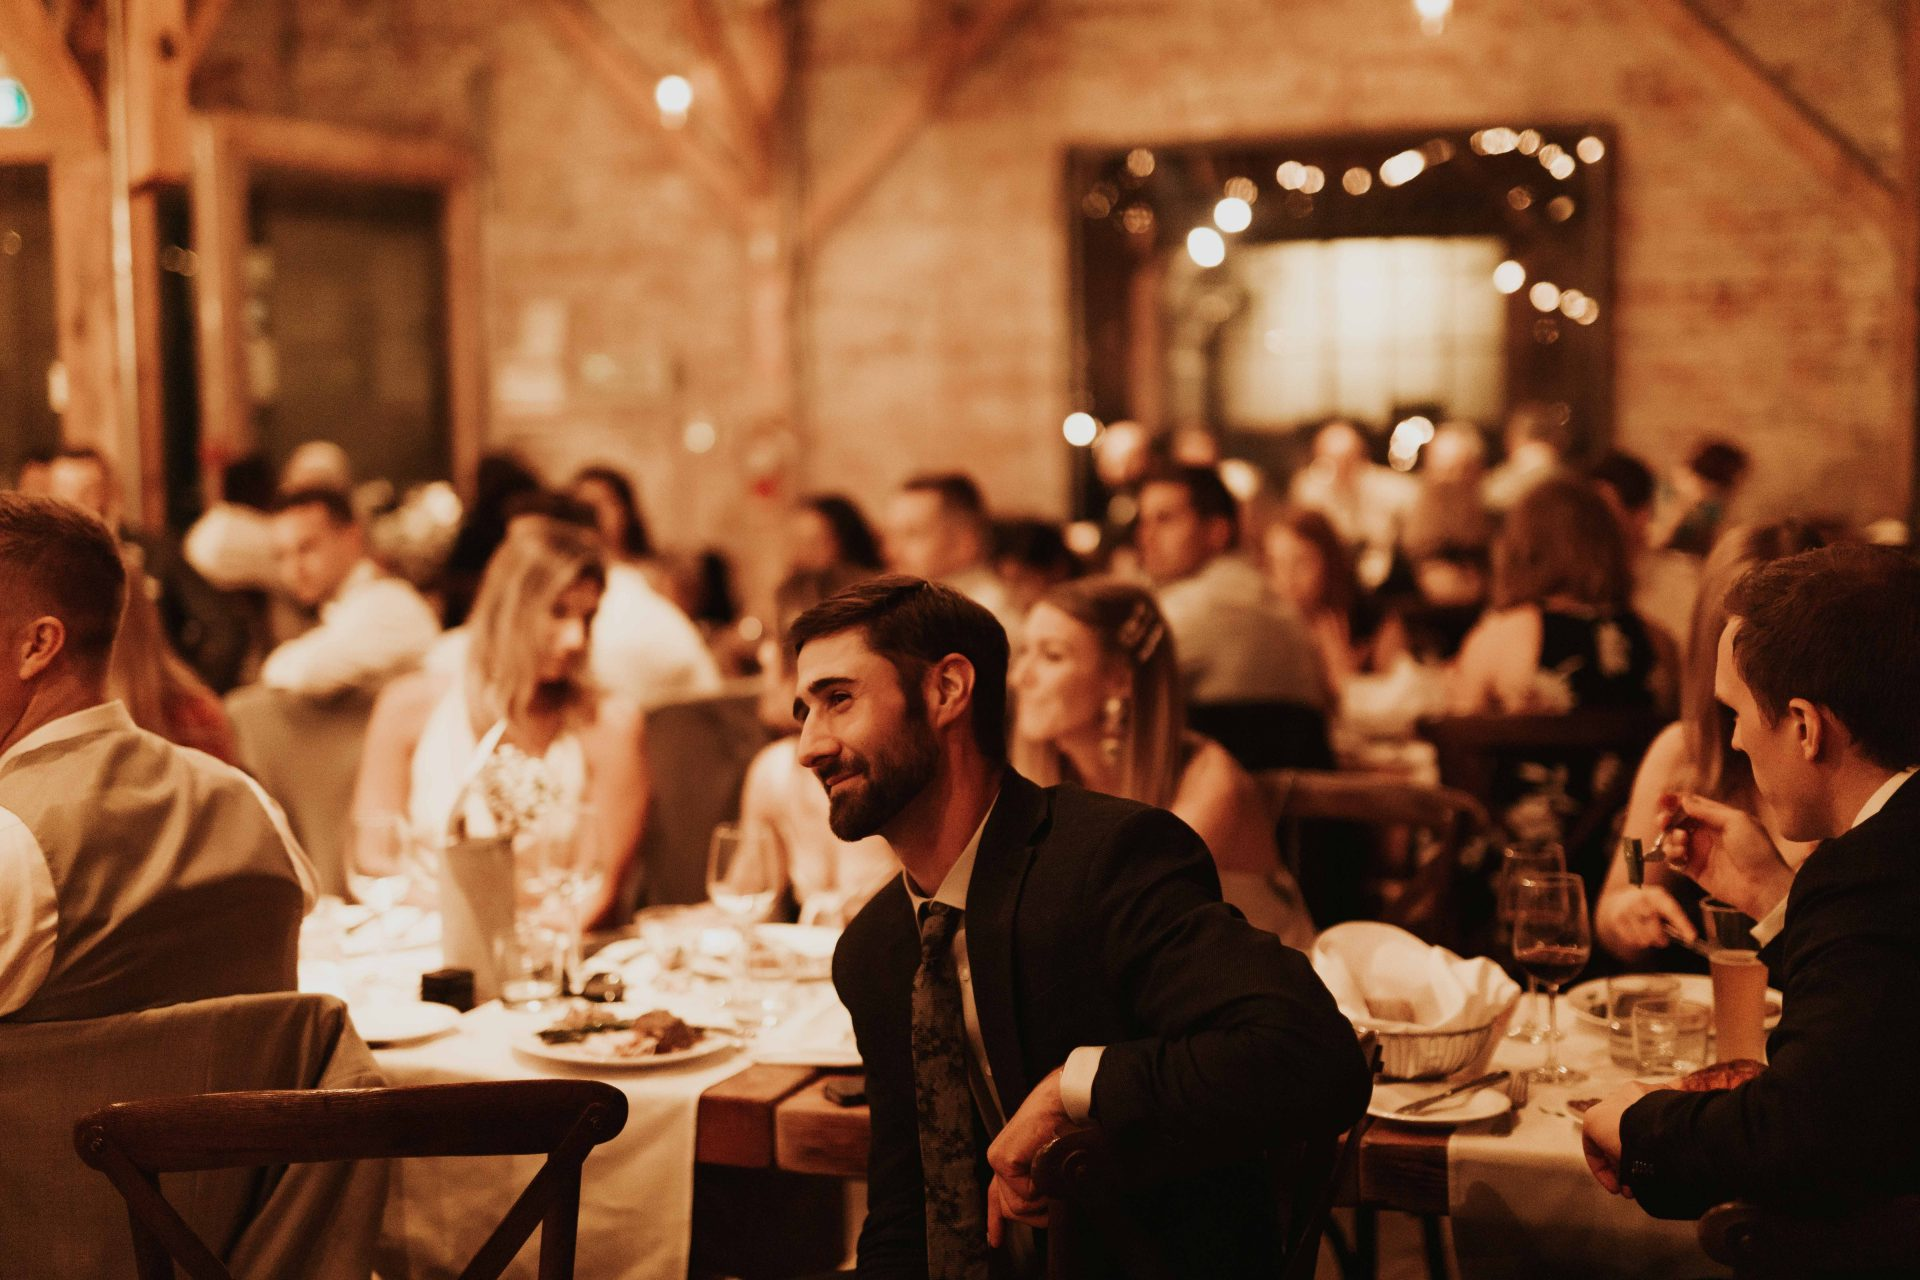 toronto distillery district wedding reception